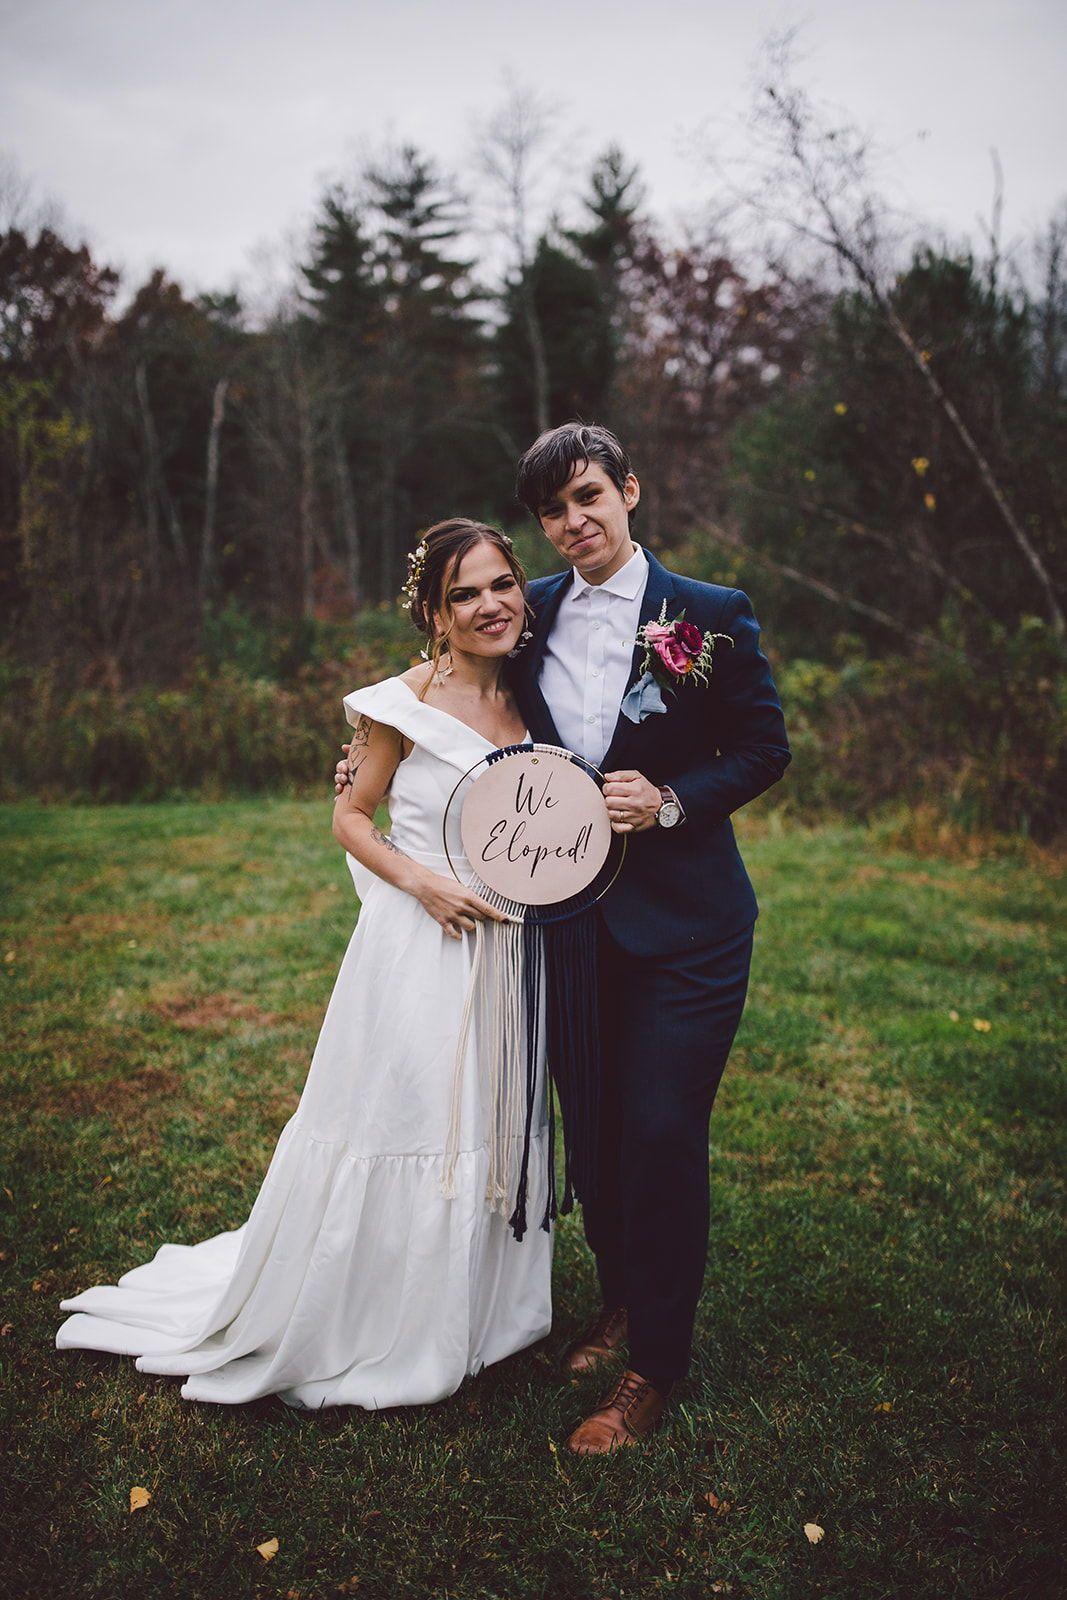 Intimate Wedding Photoshoot Outdoors In 2020 Brooklyn Wedding New York Wedding Wedding Photoshoot